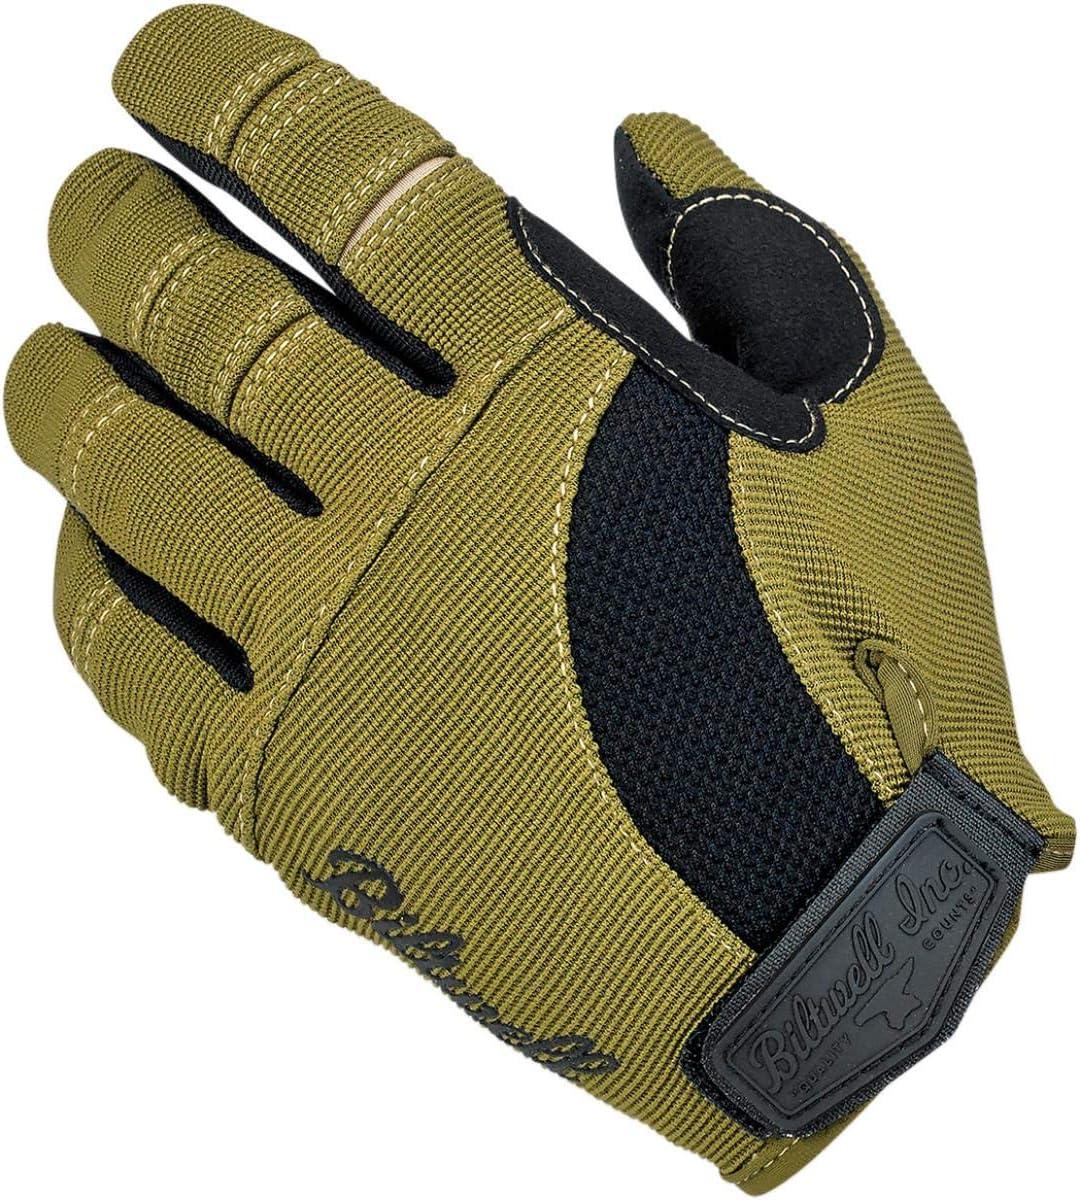 Biltwell Moto Men's Street Motorcycle Gloves